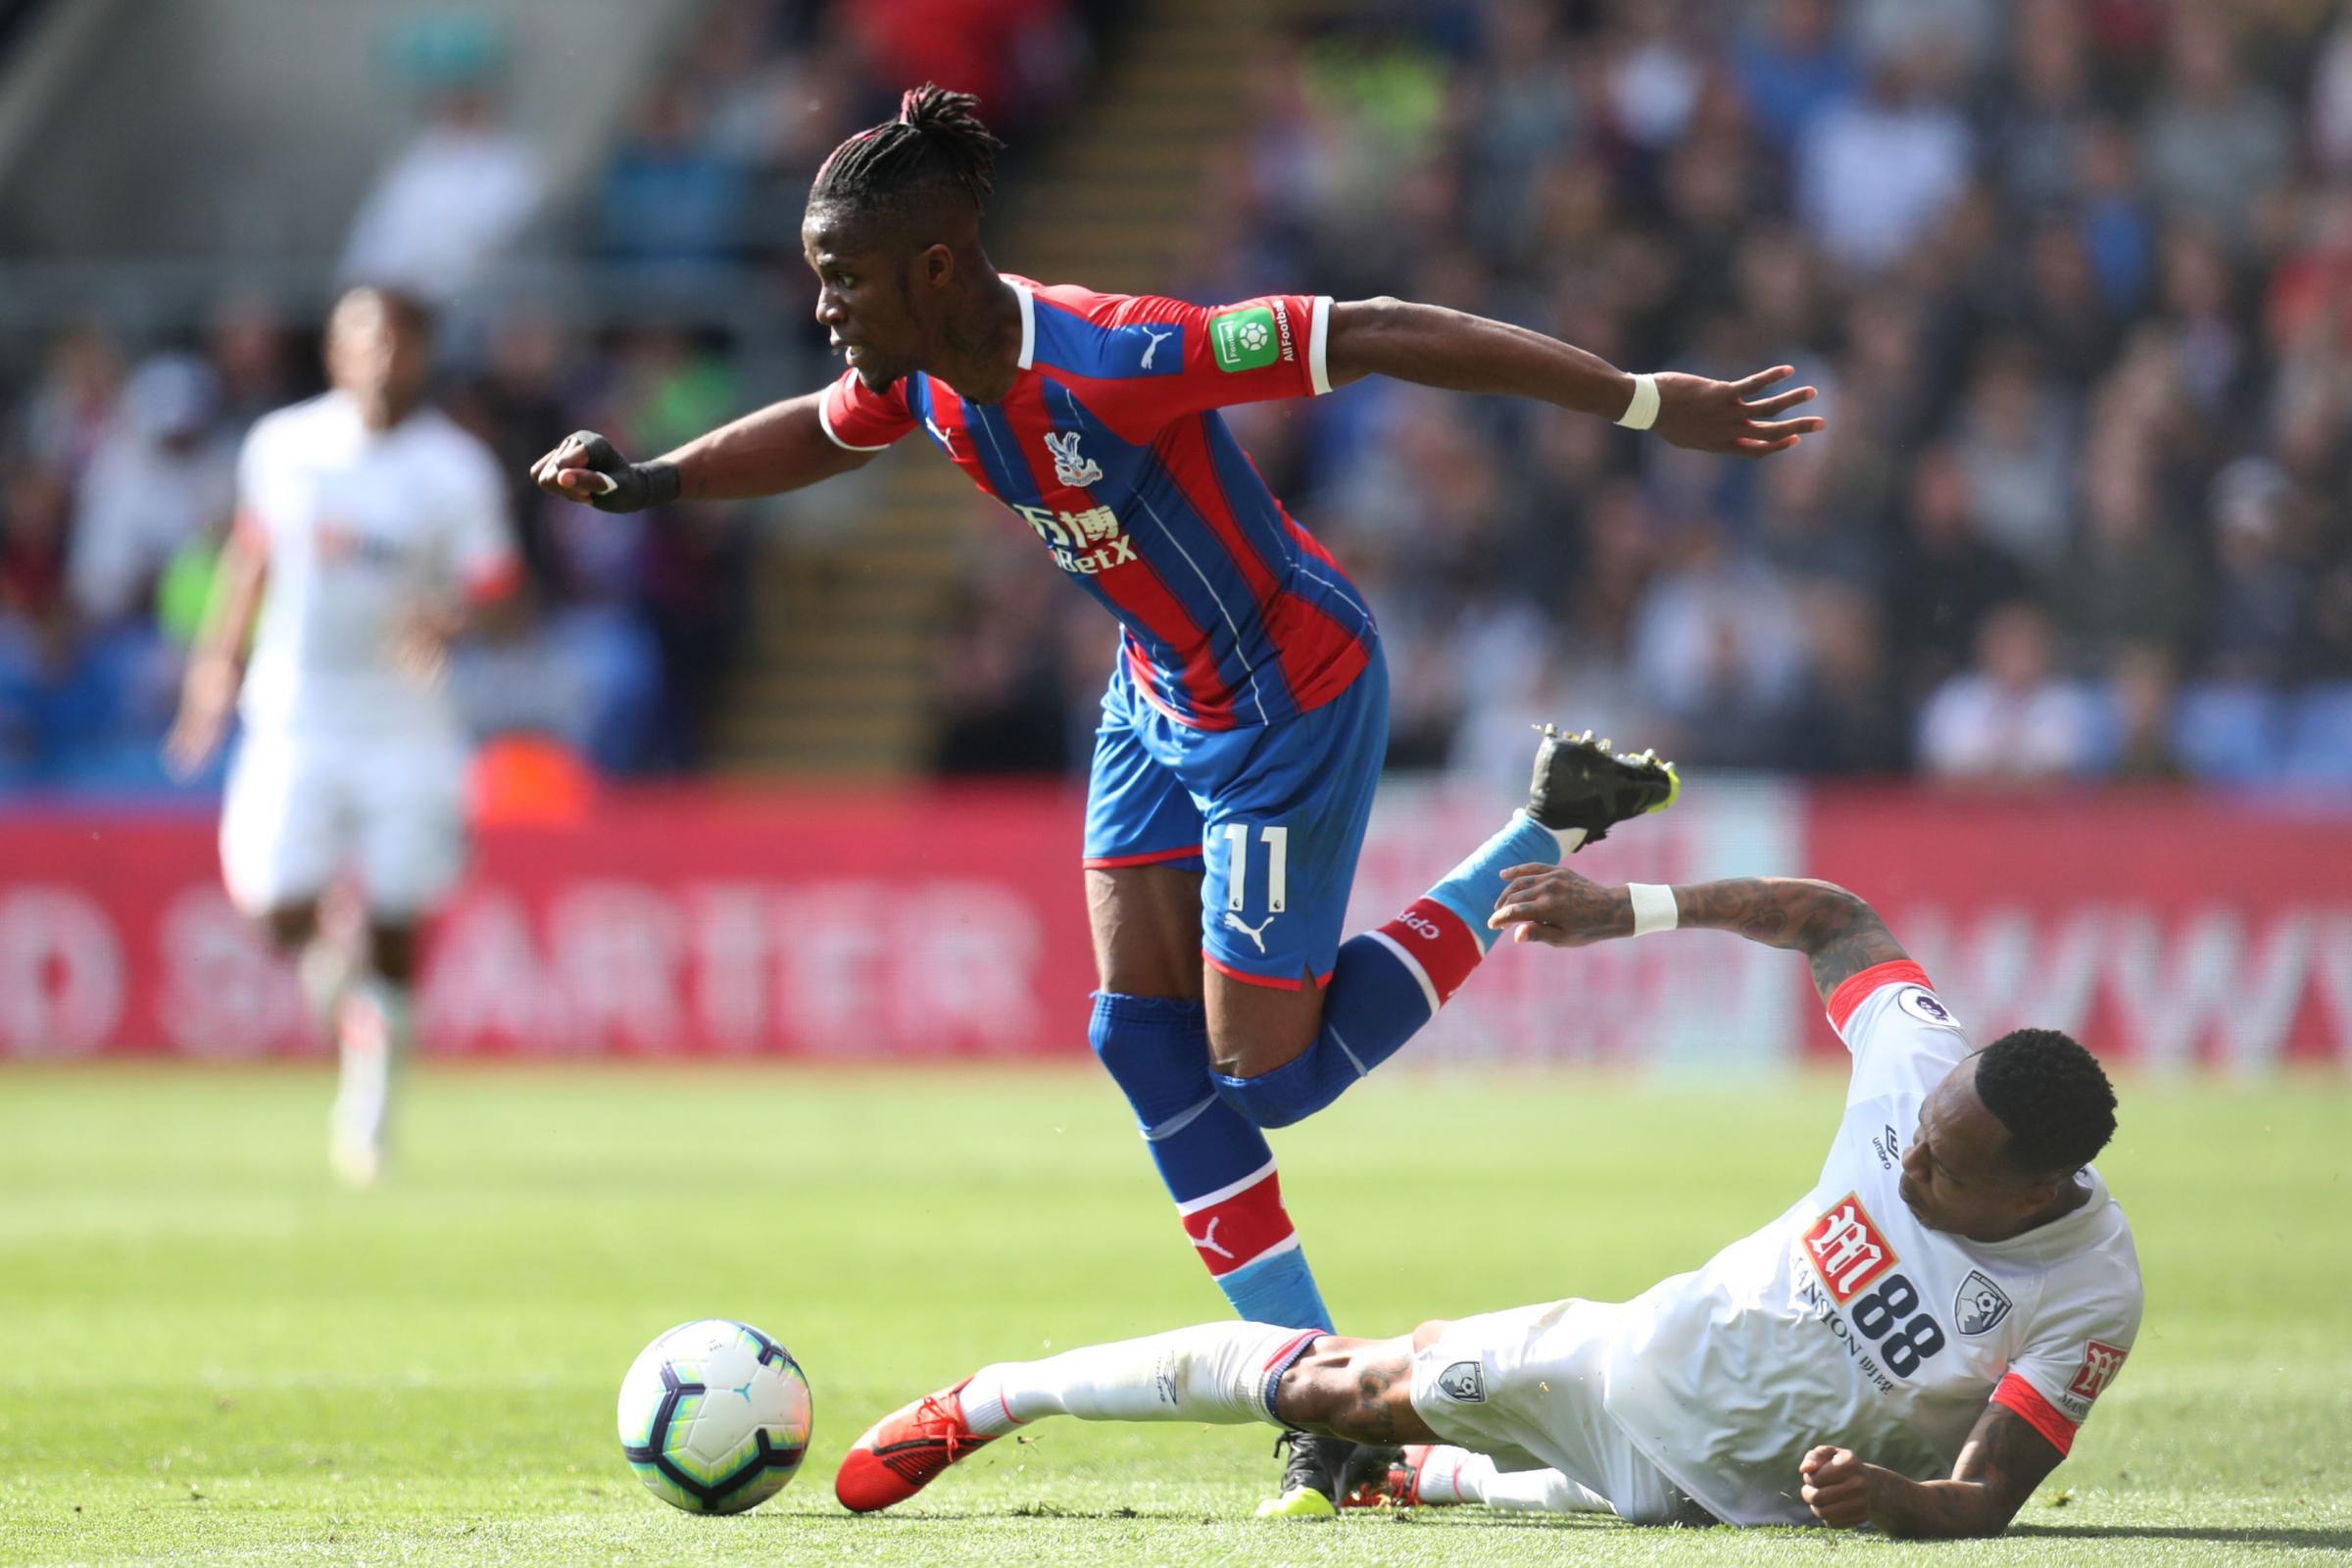 Zaha 'dominated the game' against Cherries, says Ake